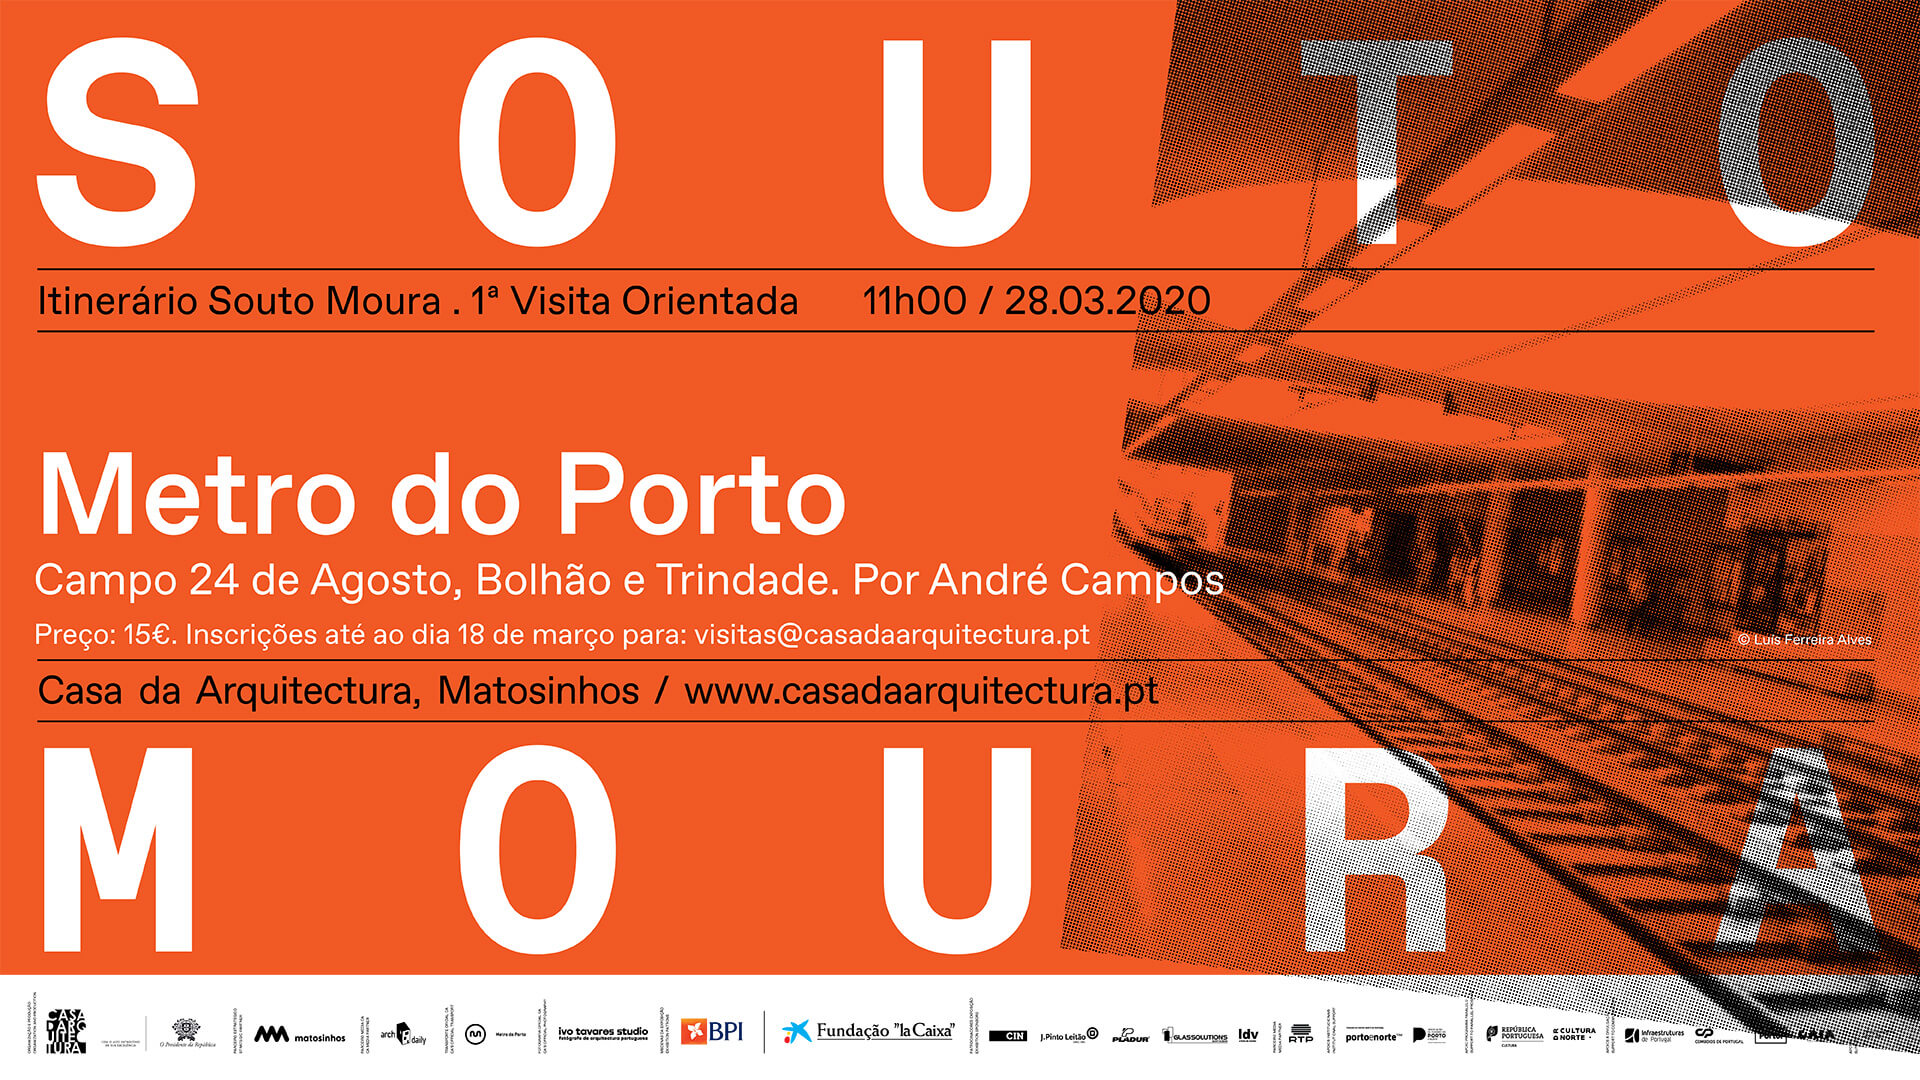 Itinerário Souto de Moura: oito visitas a 15 obras